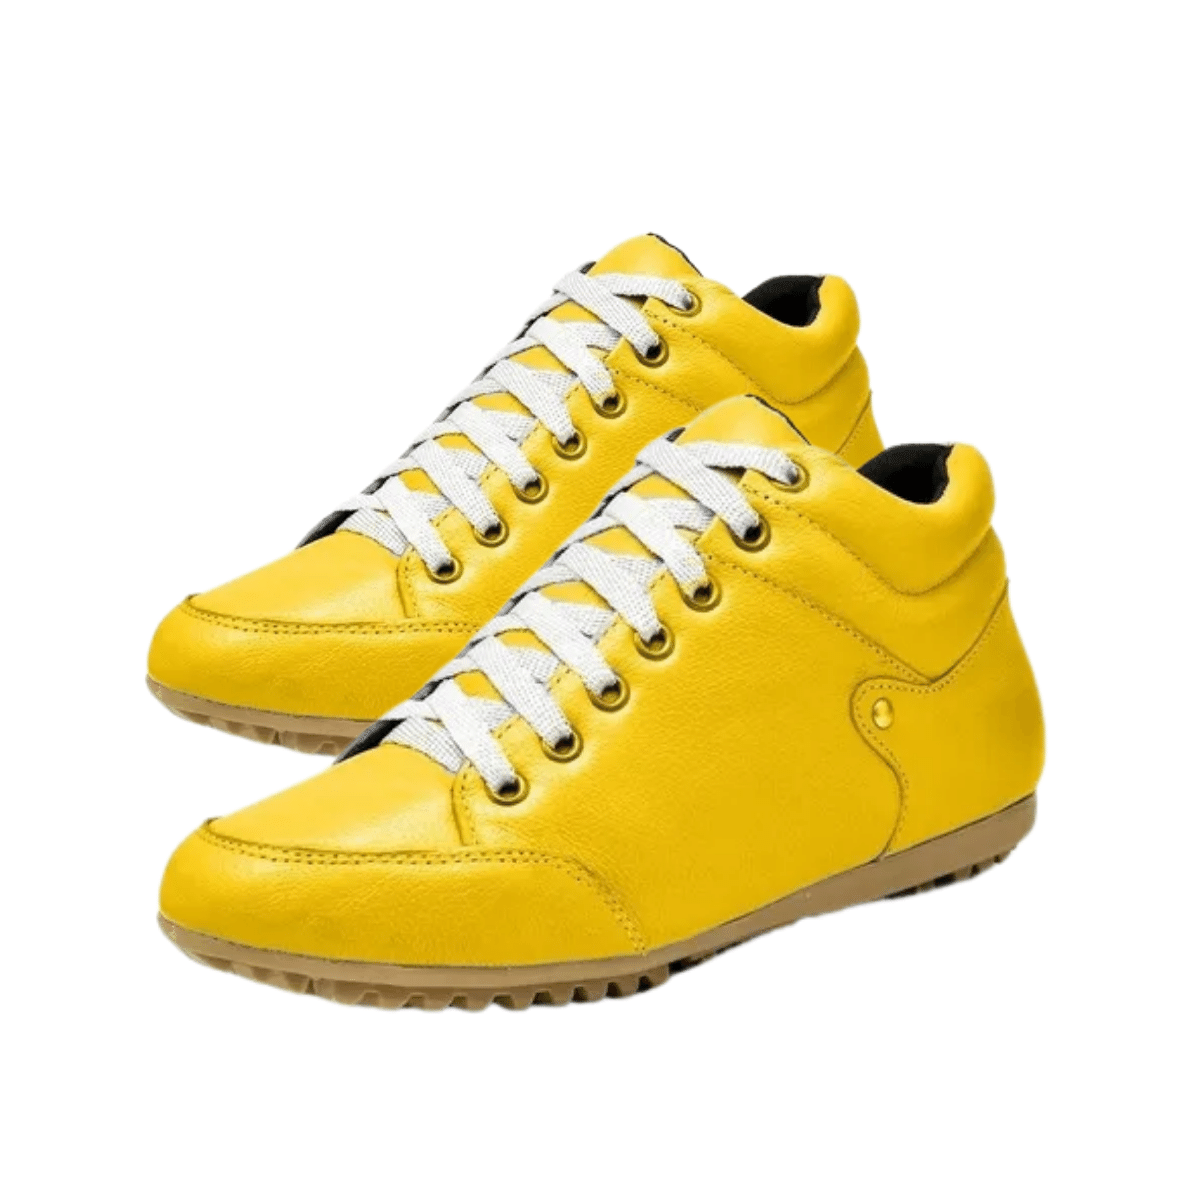 Botinha Casual Rasteira Gommix Couro Amarelo